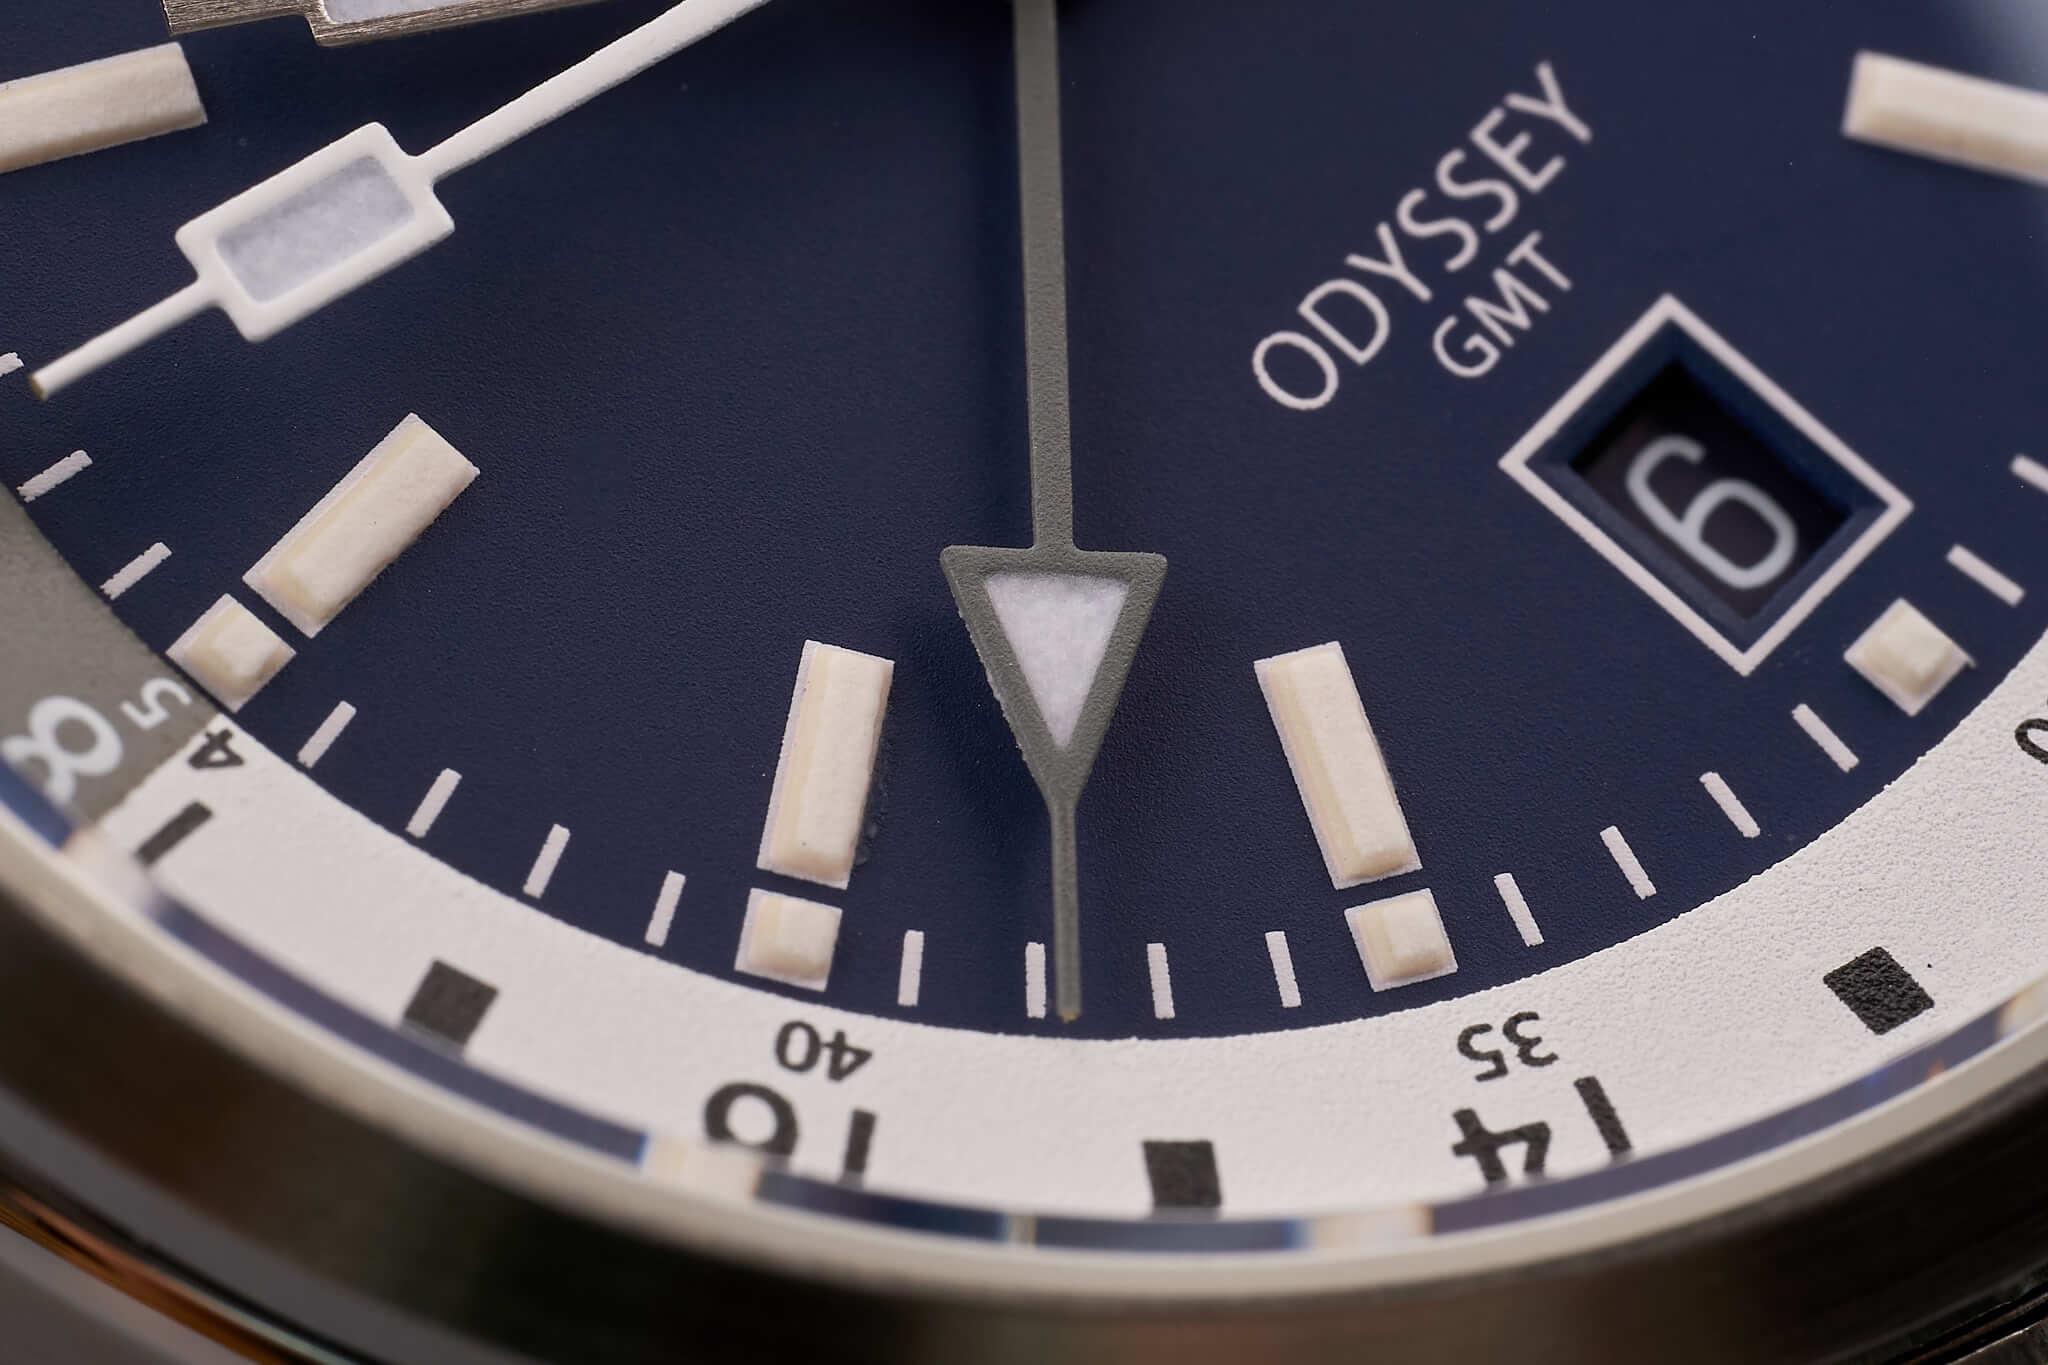 emg-odyssey-15